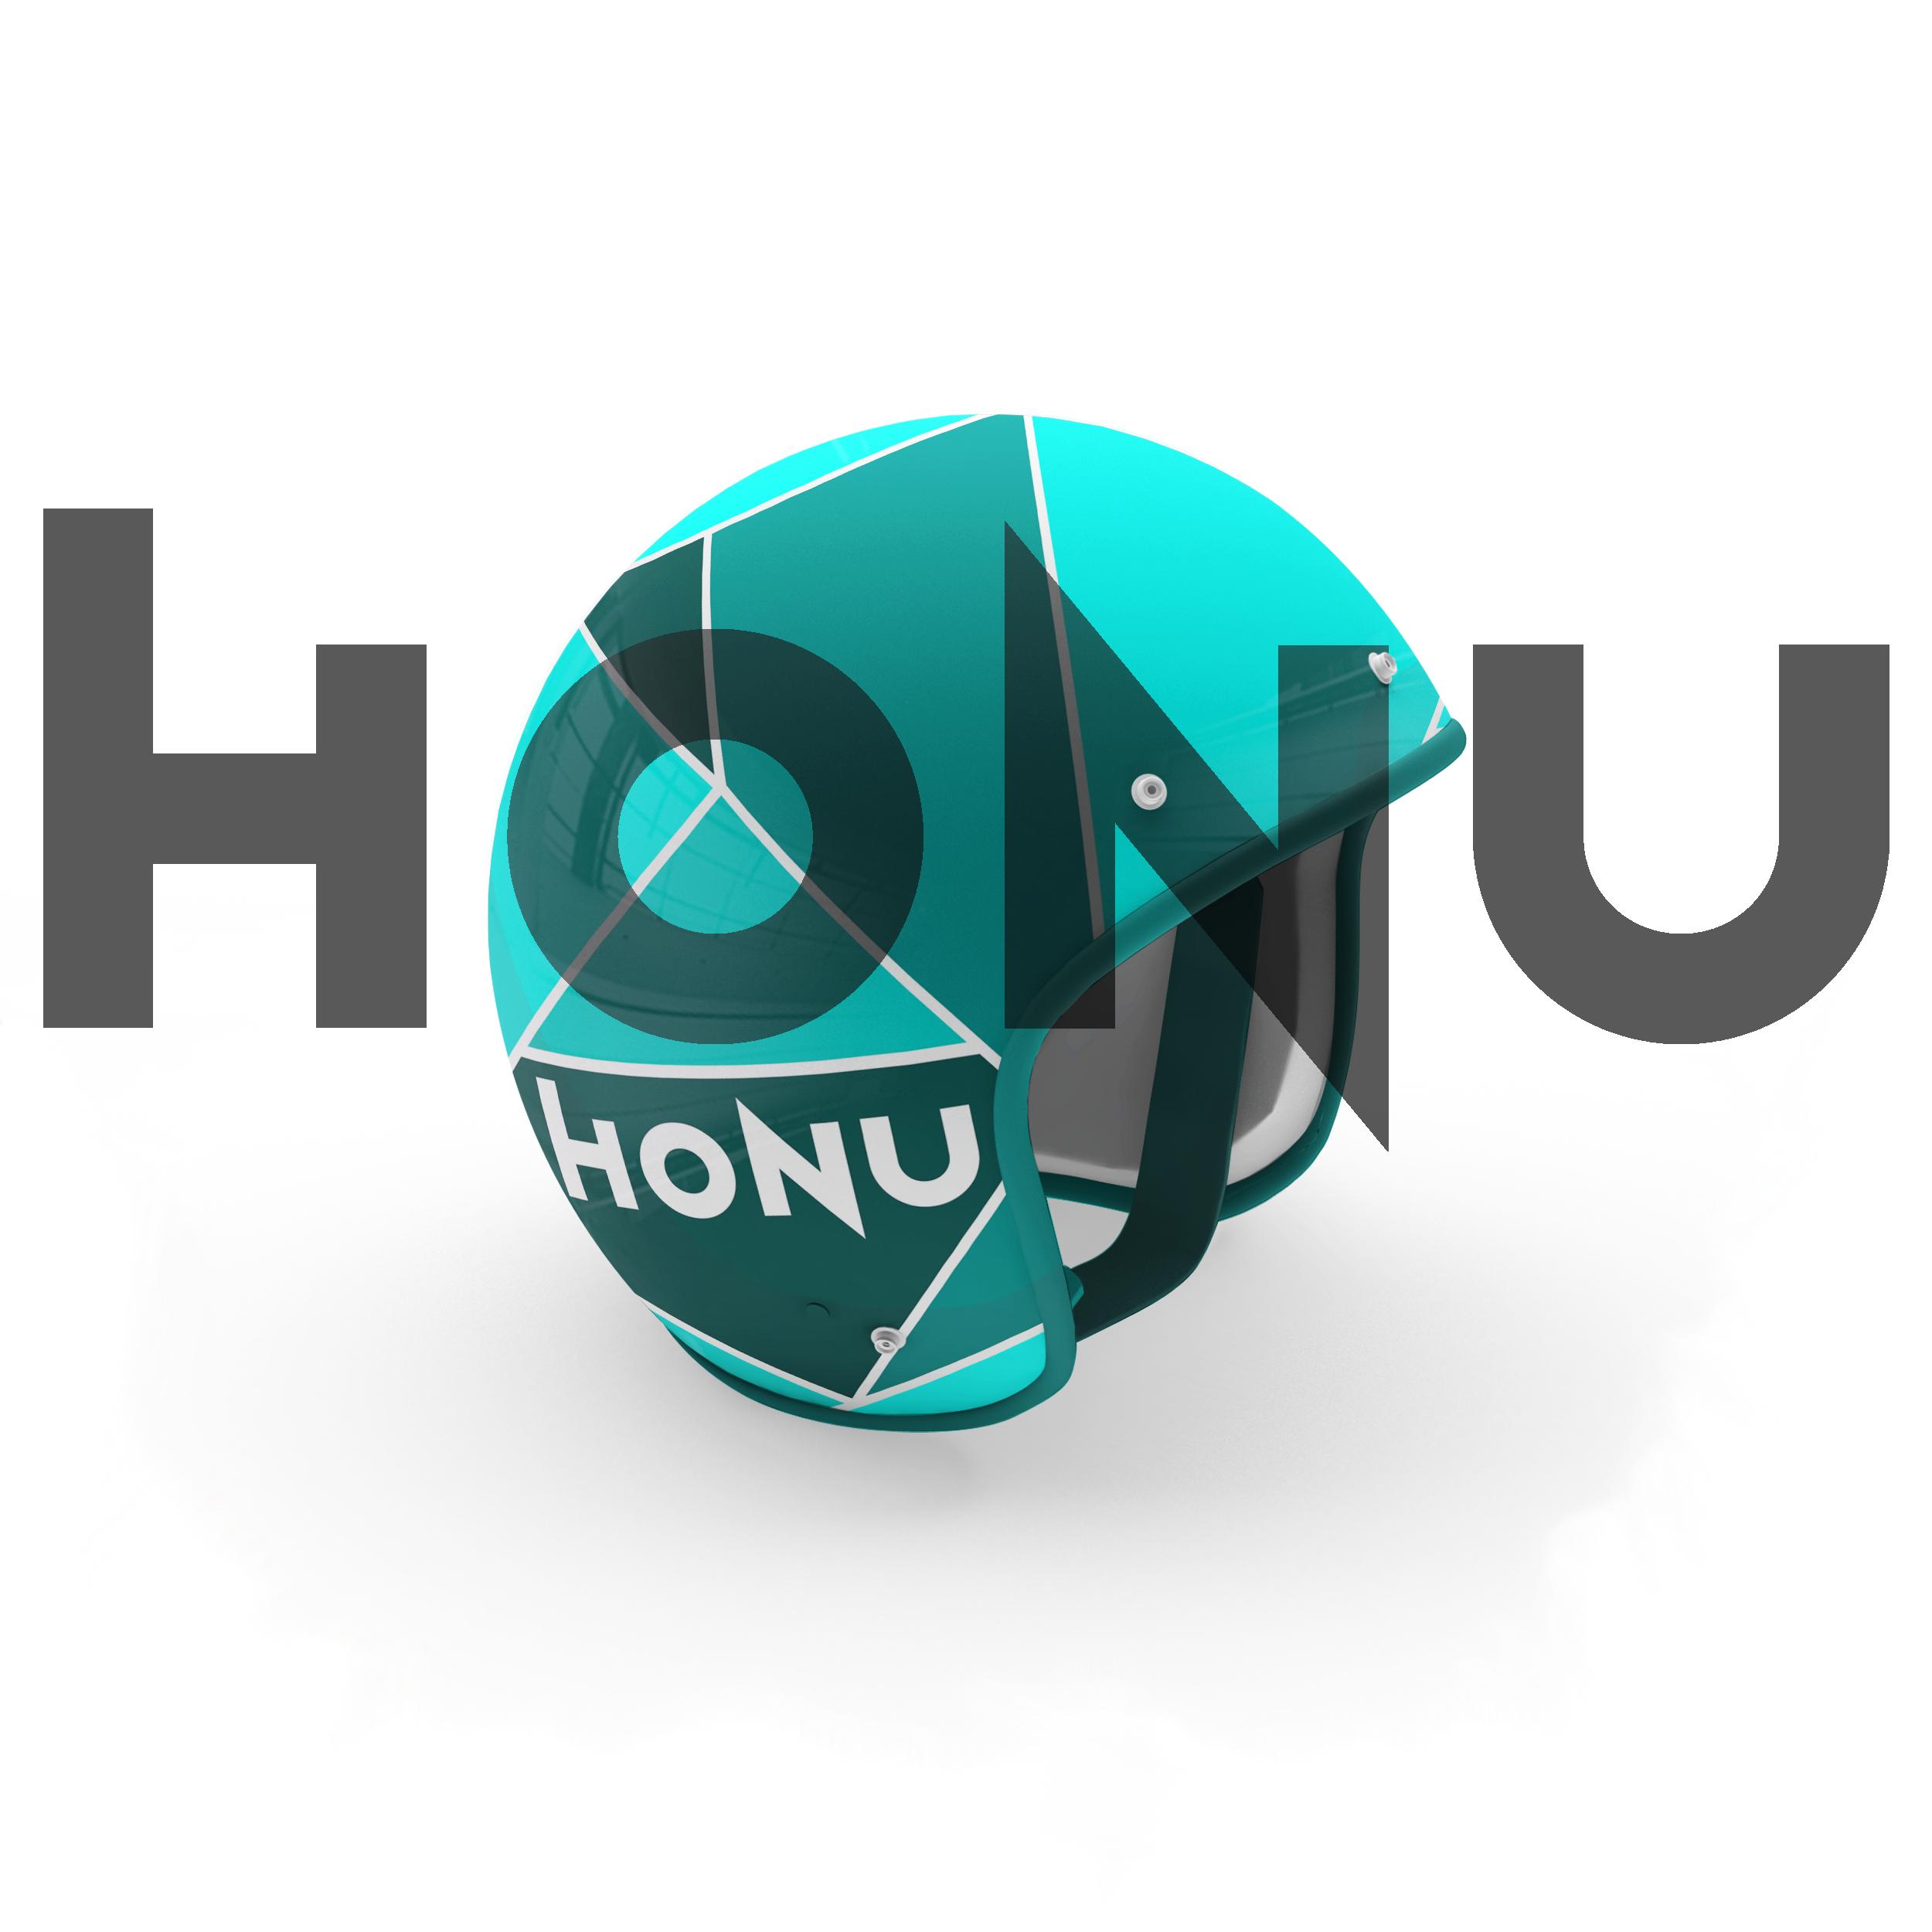 honu_seb_home_blur.png